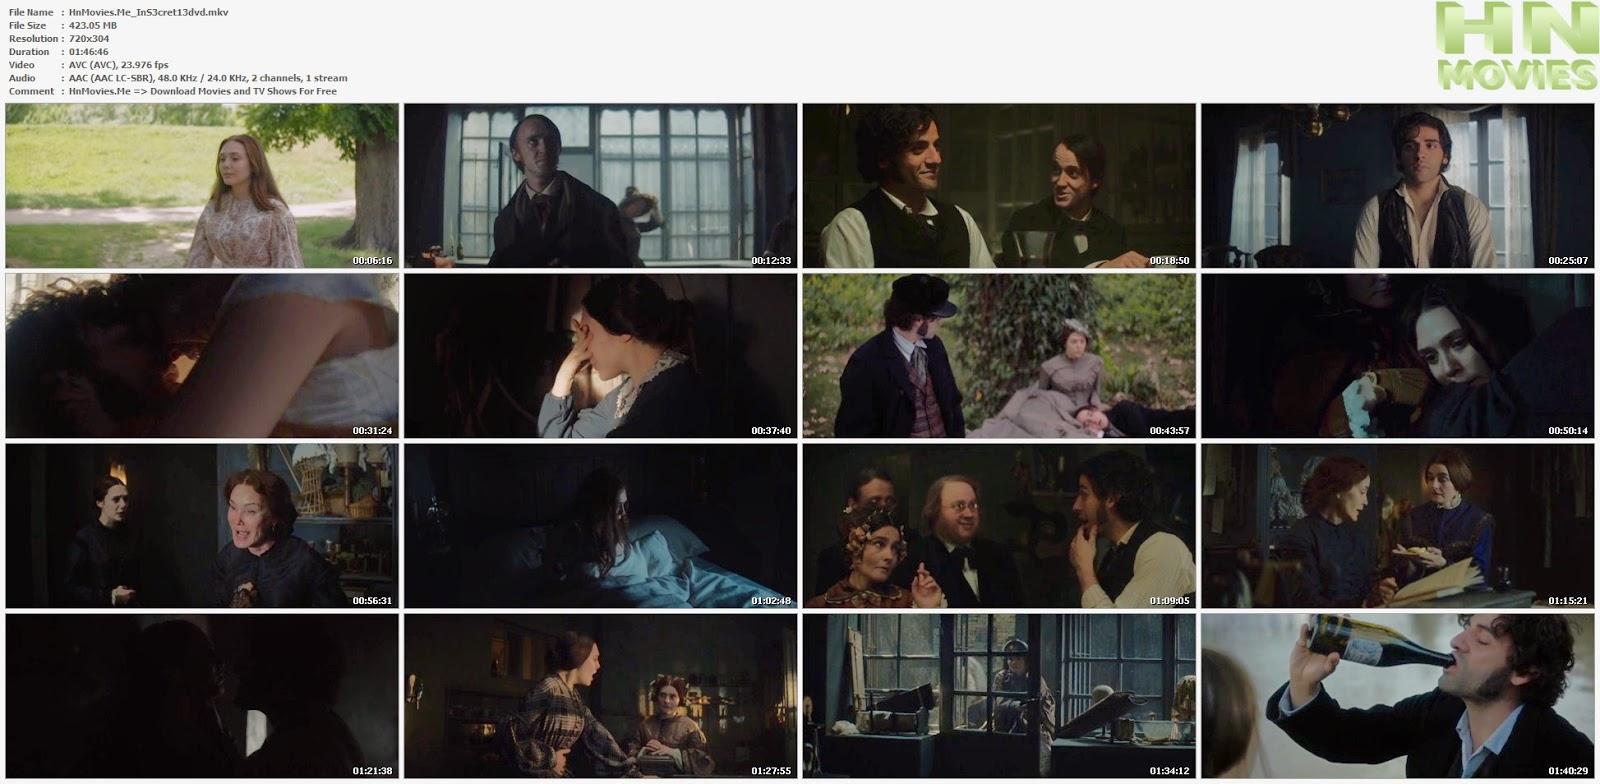 movie screenshot of In Secret fdmovie.com